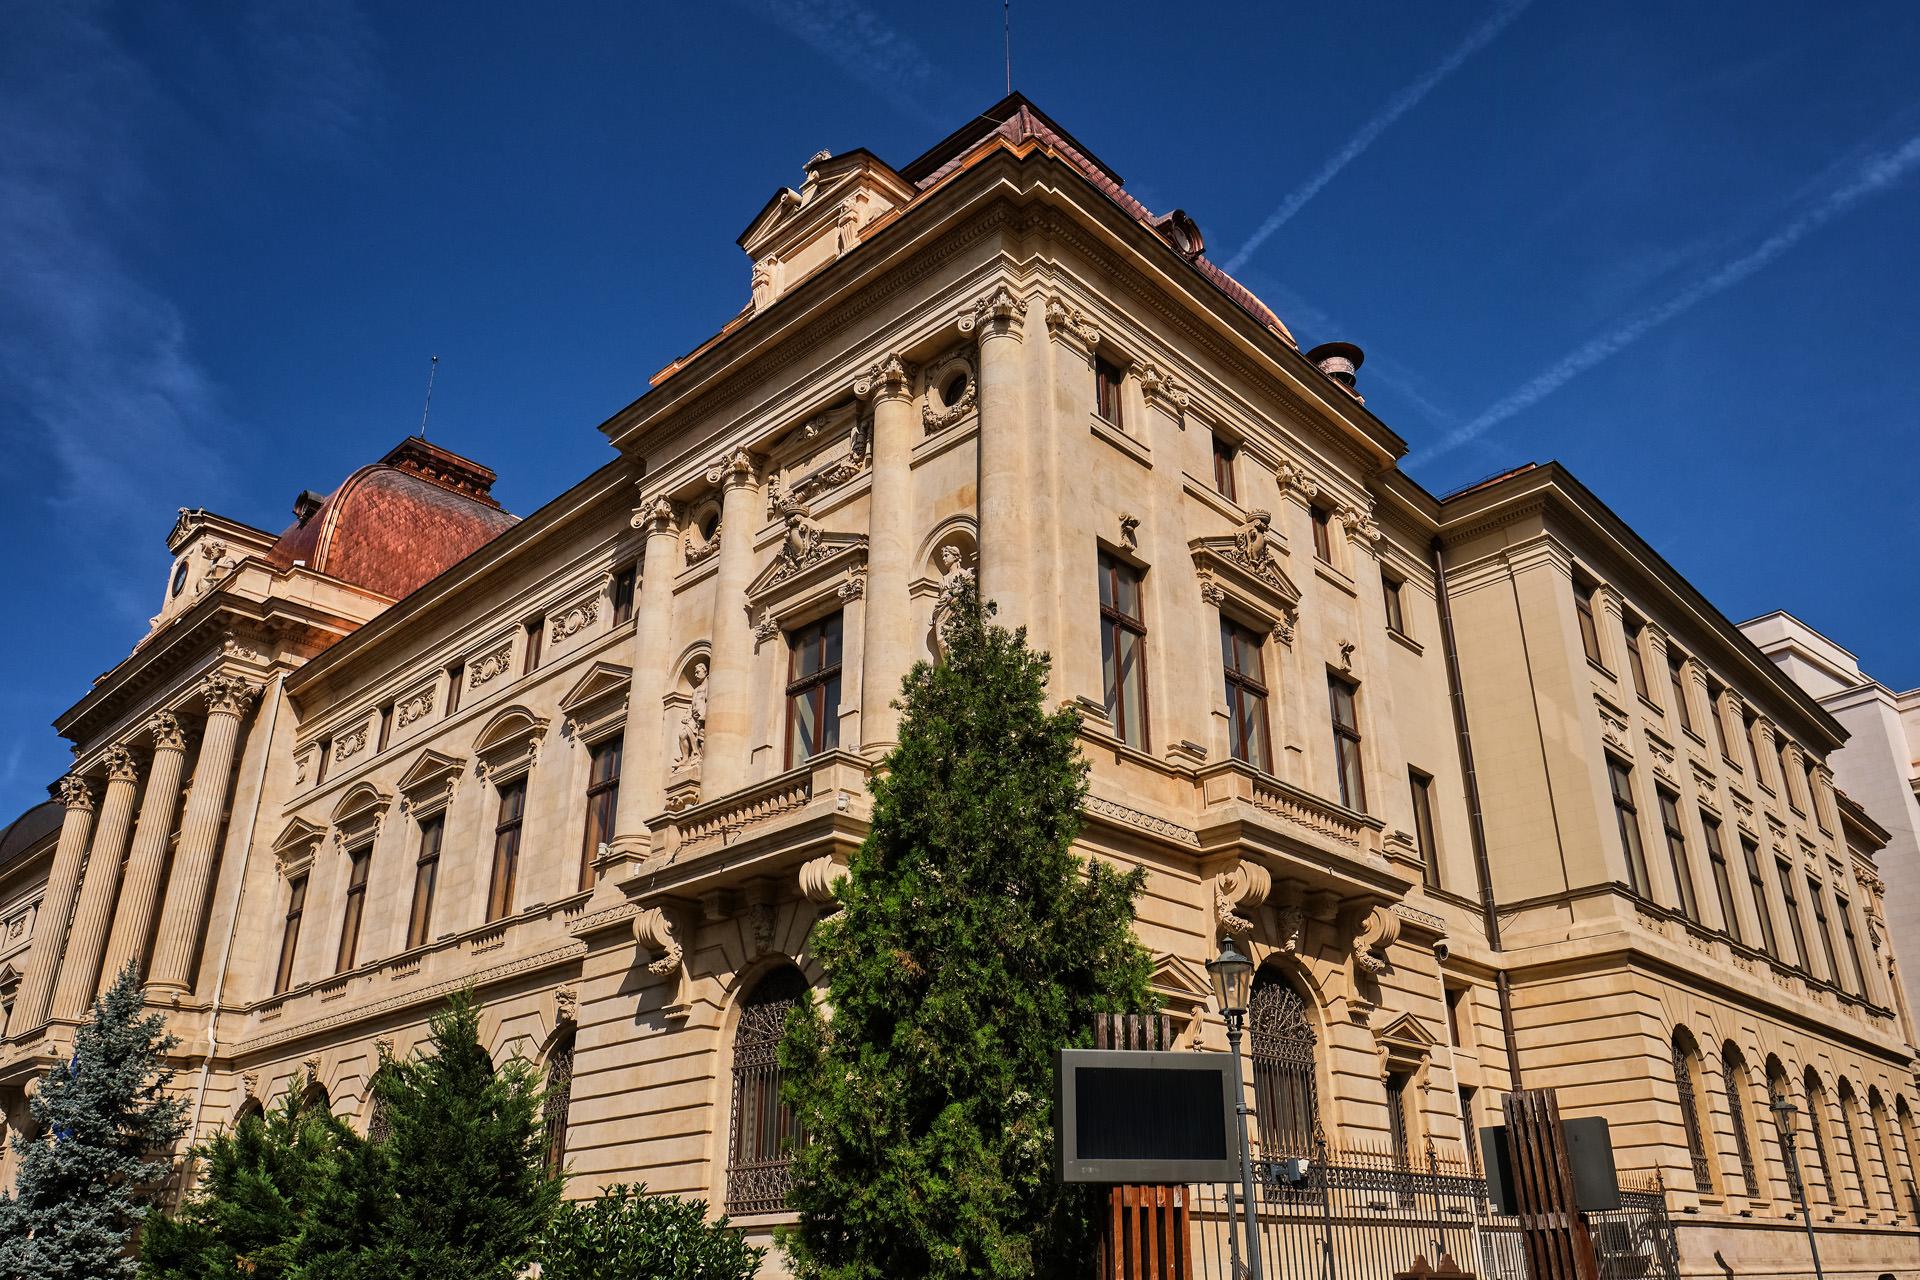 Bucharest Old Town 02